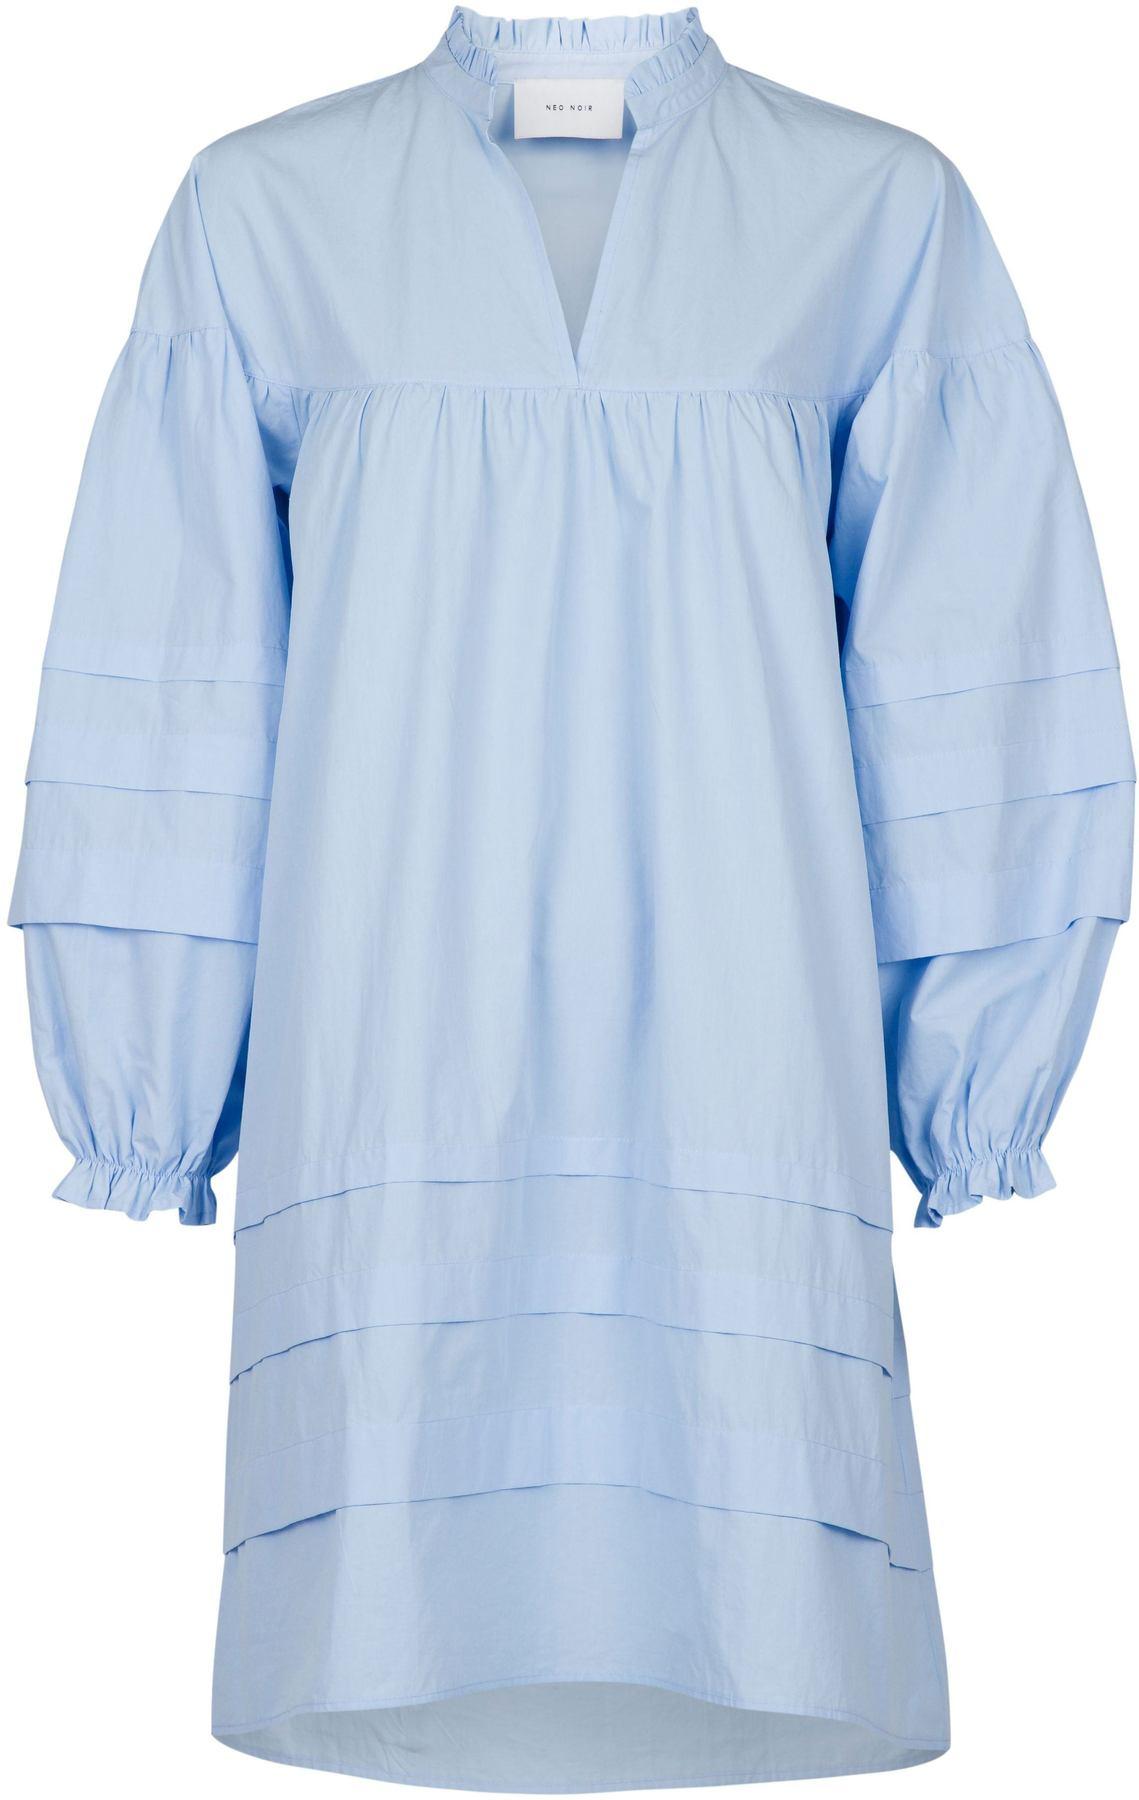 Neo Noir Holly kjole, Light Blue, 38